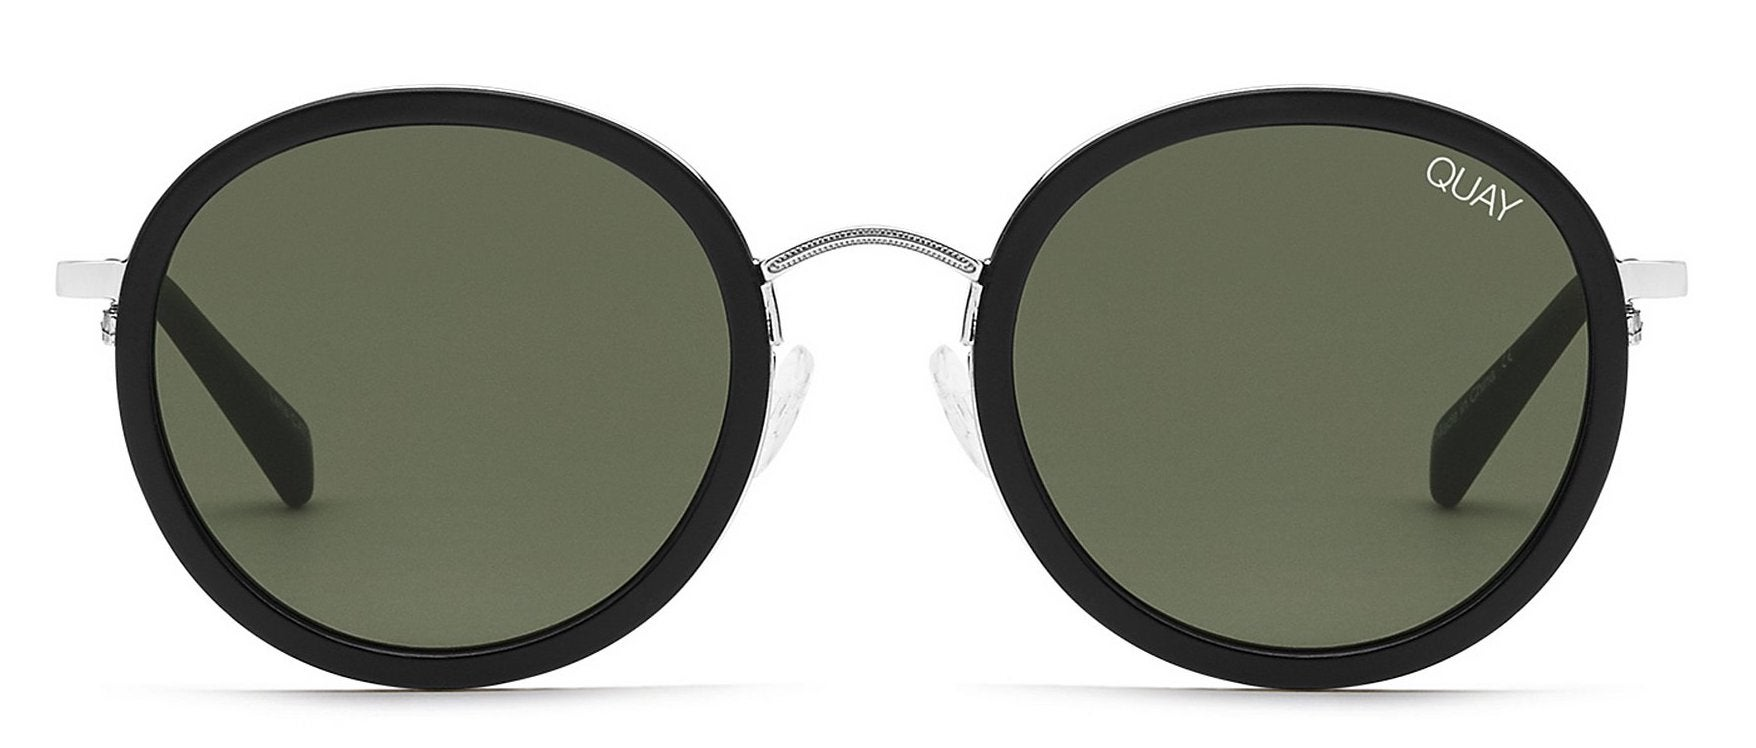 Quay Australia Firefly incógnito gafas de sol redondas